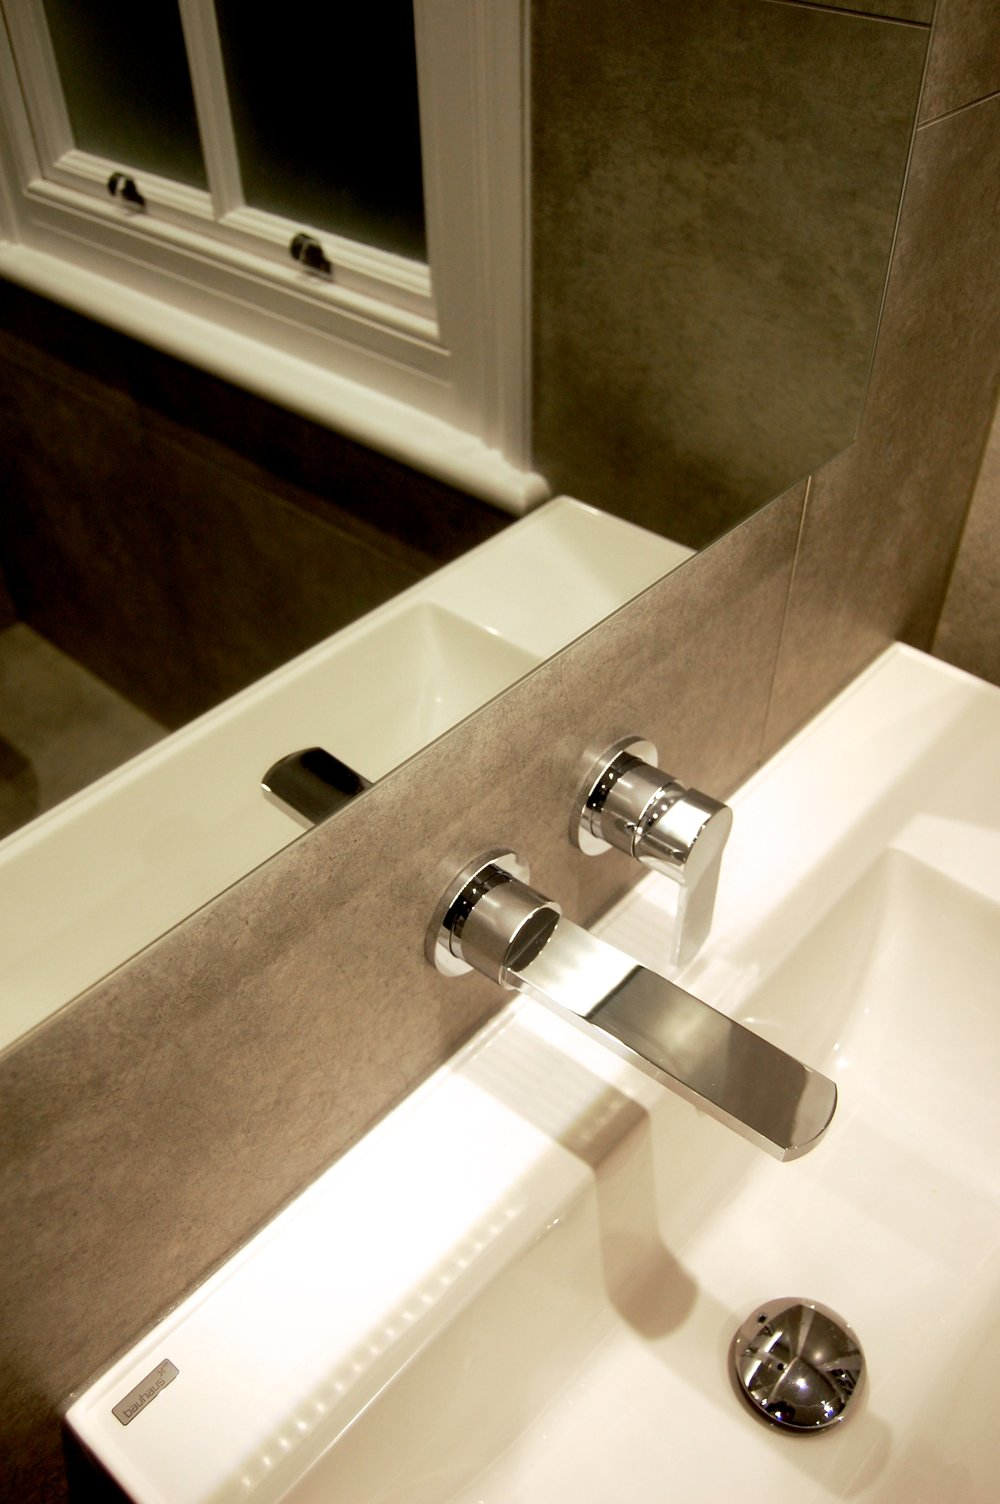 Retreat Bathrooms Bathroom Design, Refurbishment, Supply & Installation Teddington, Richmond 765.jpg